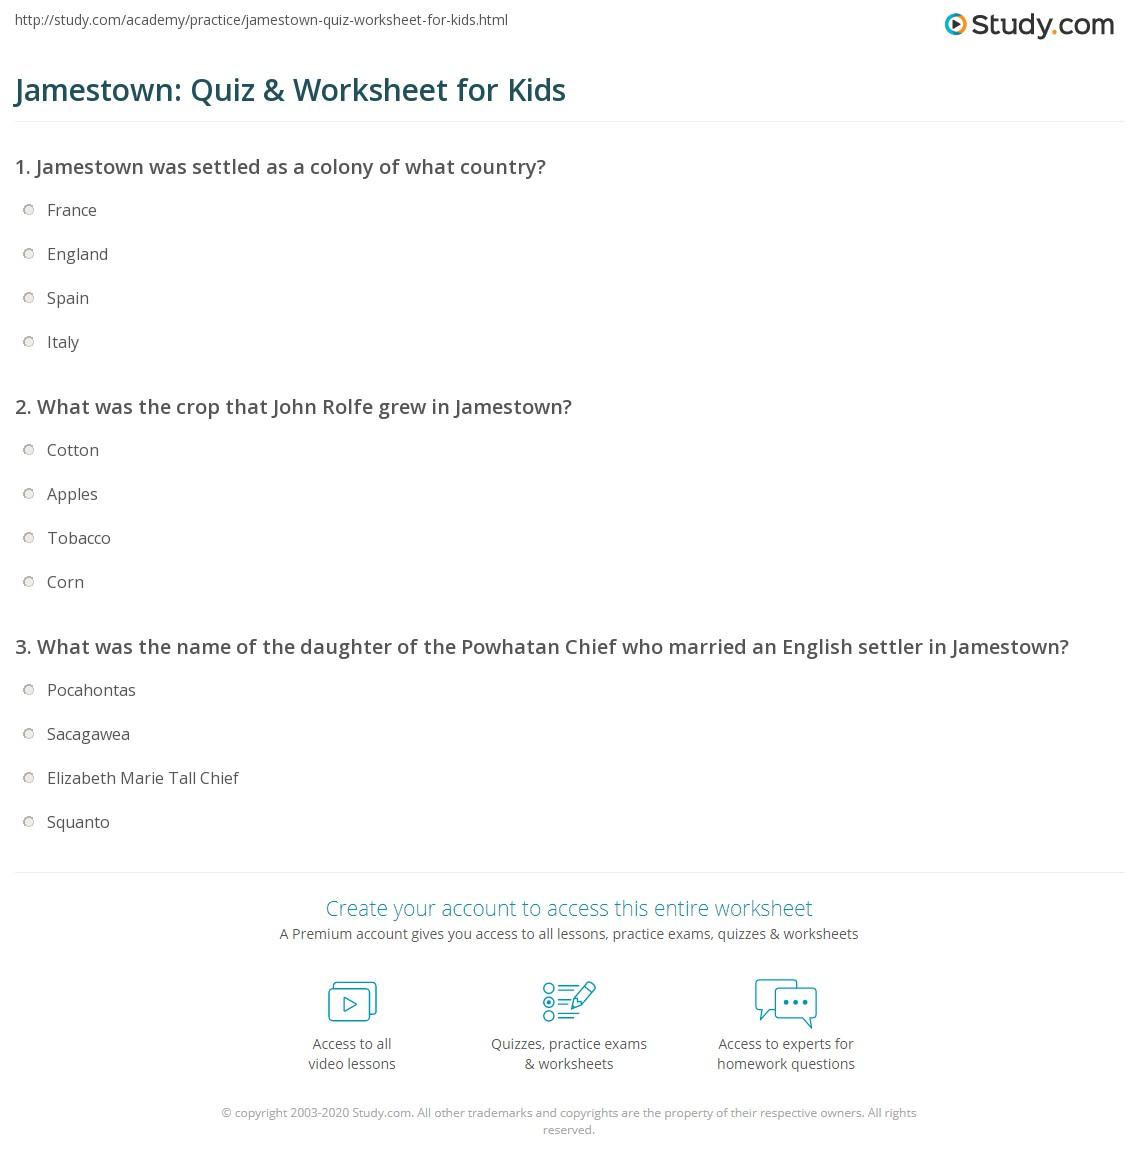 Jamestown: Quiz & Worksheet for Kids | Study.com